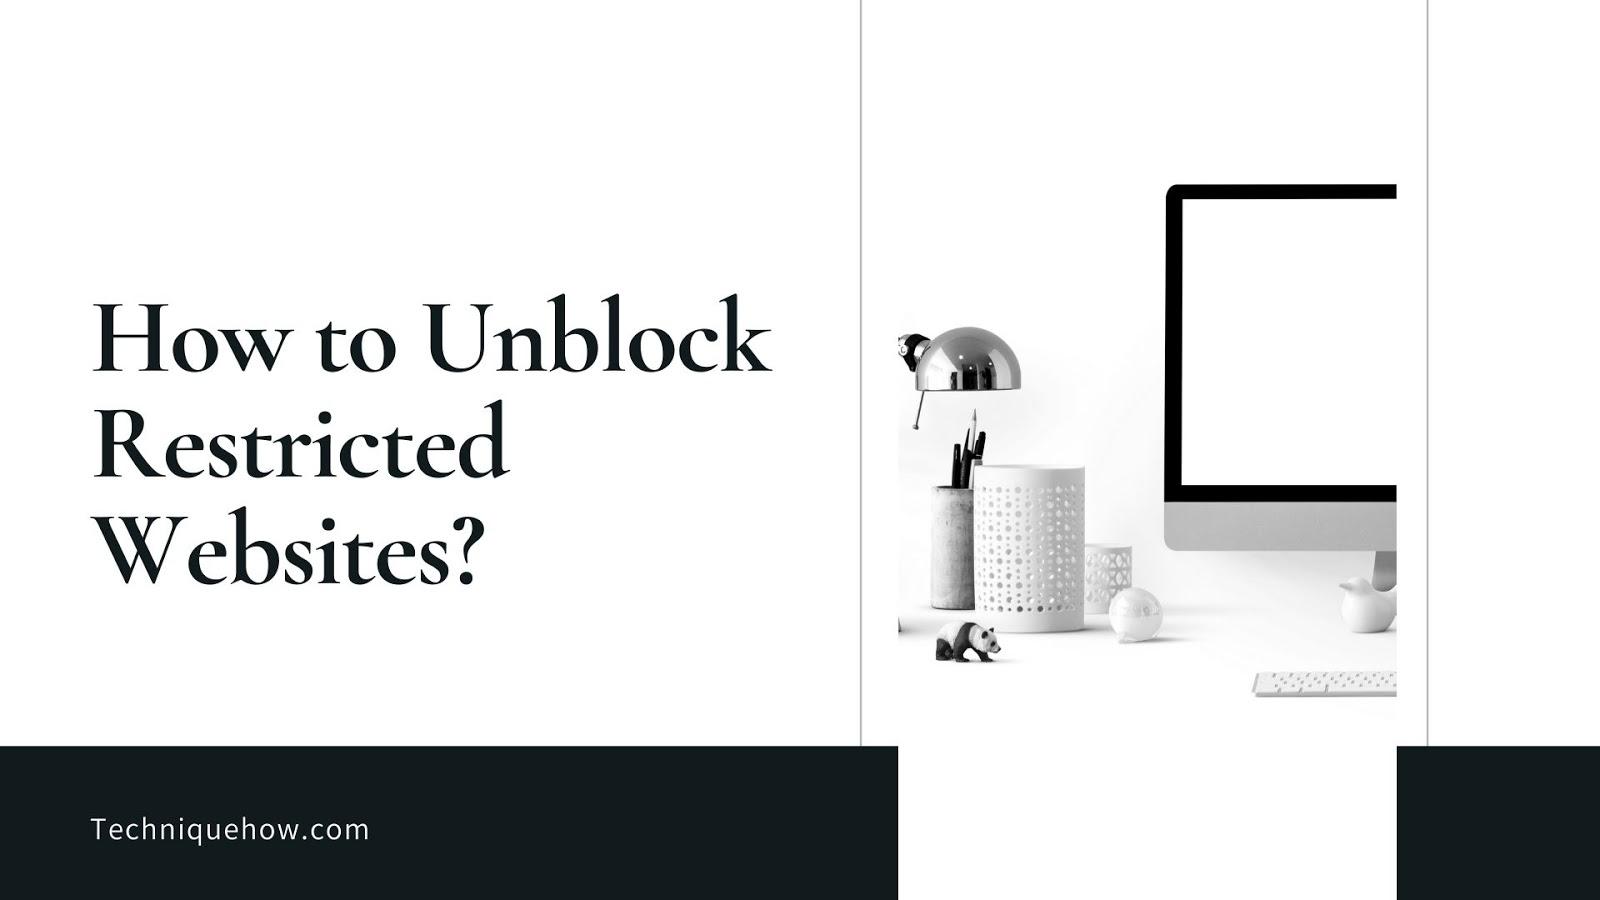 unblock websites